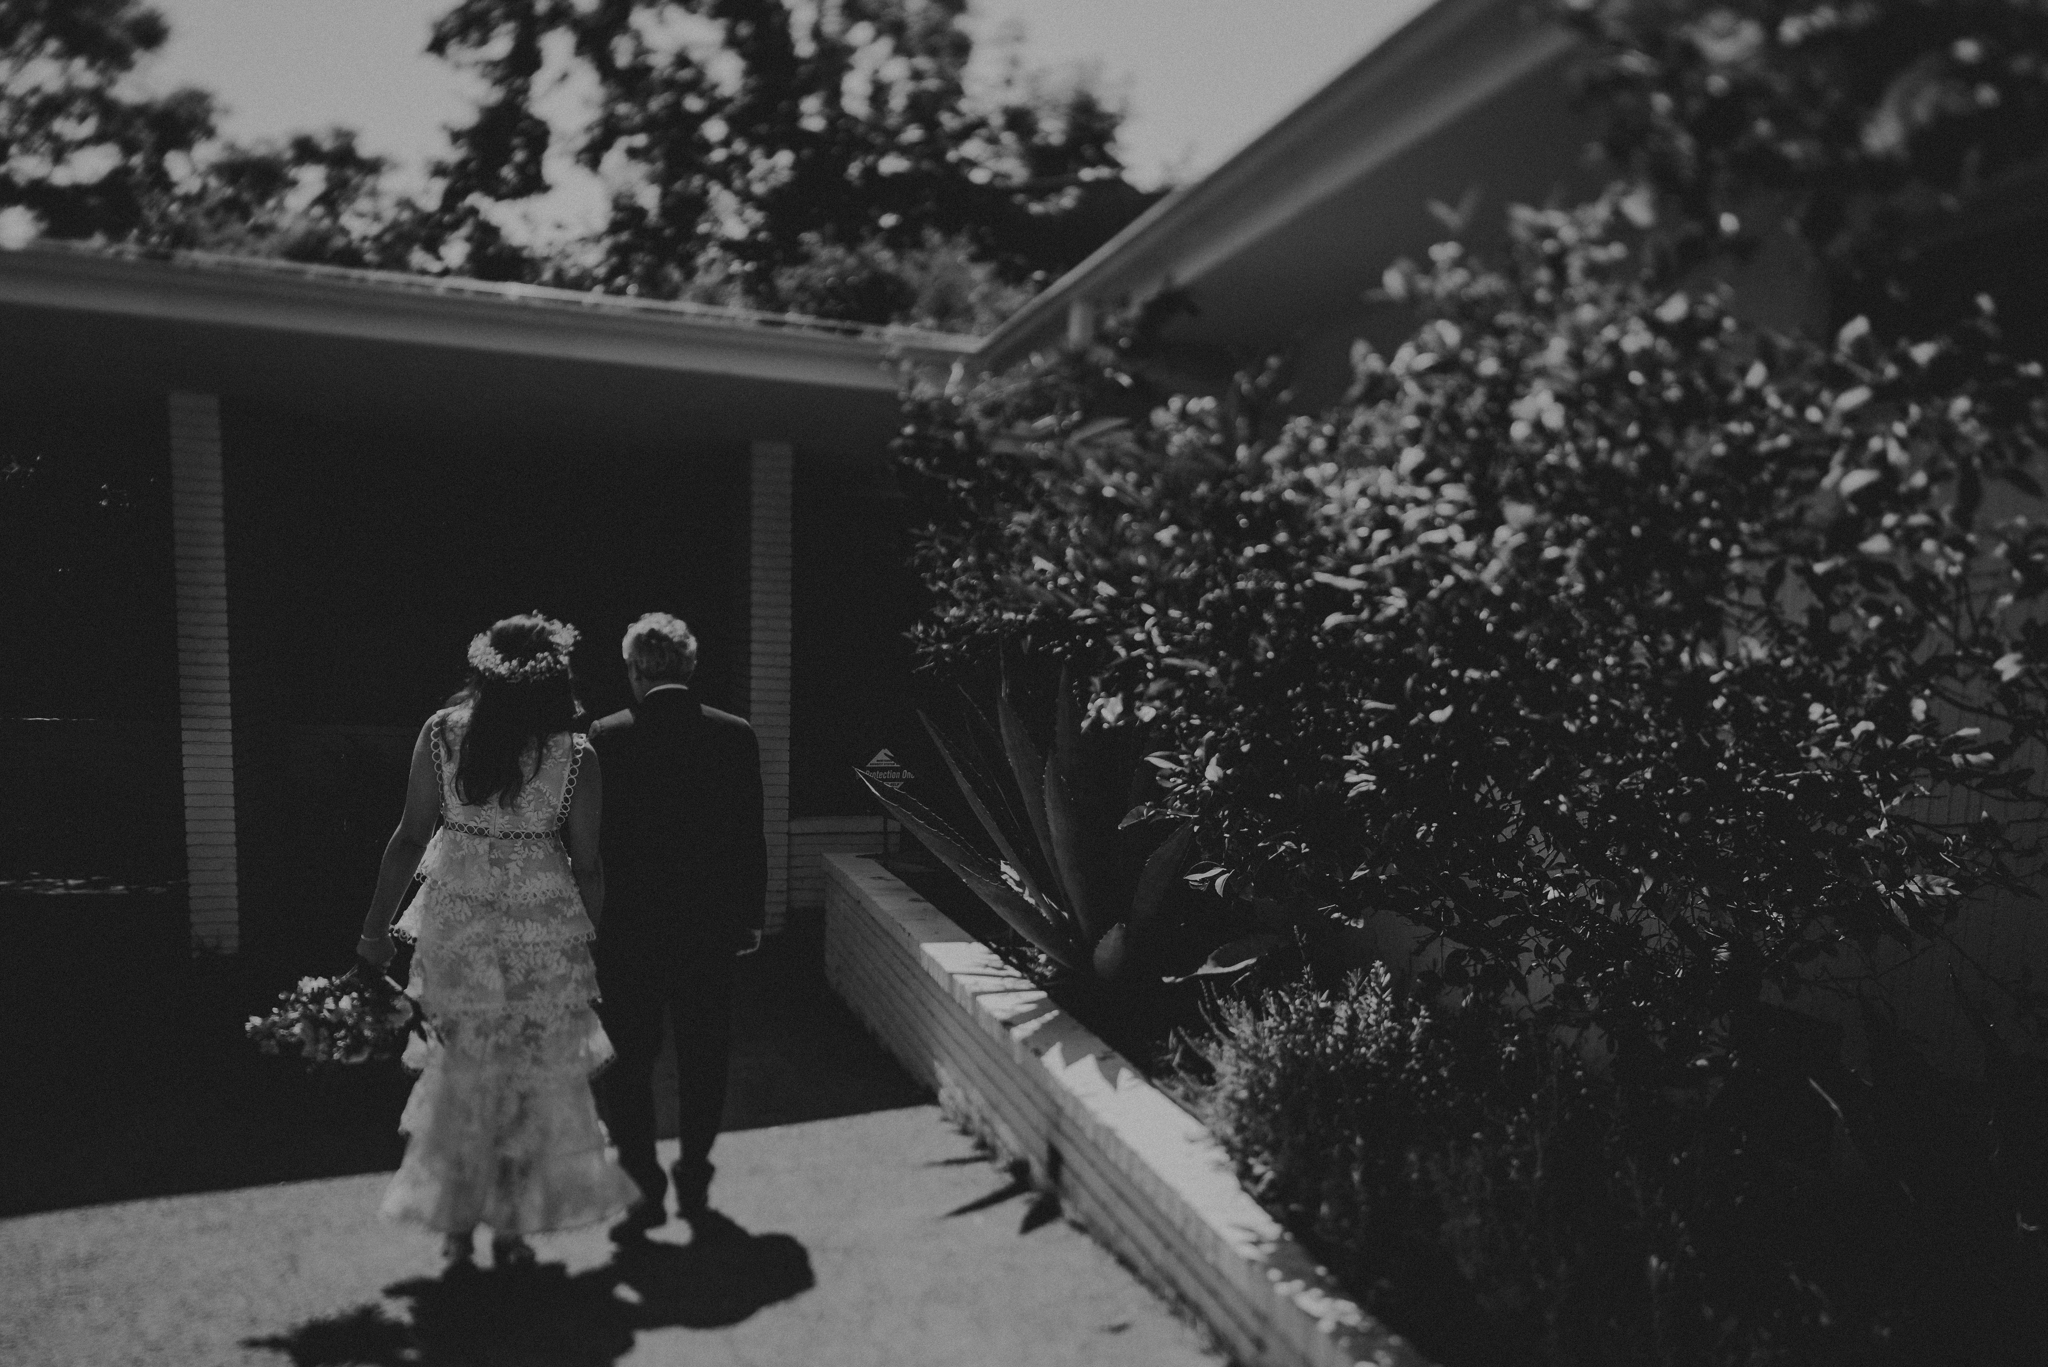 Isaiah + Taylor Photography - Private Estate Backyard Wedding - Beverly Hills - Los Angeles Wedding Photographer - 22.jpg